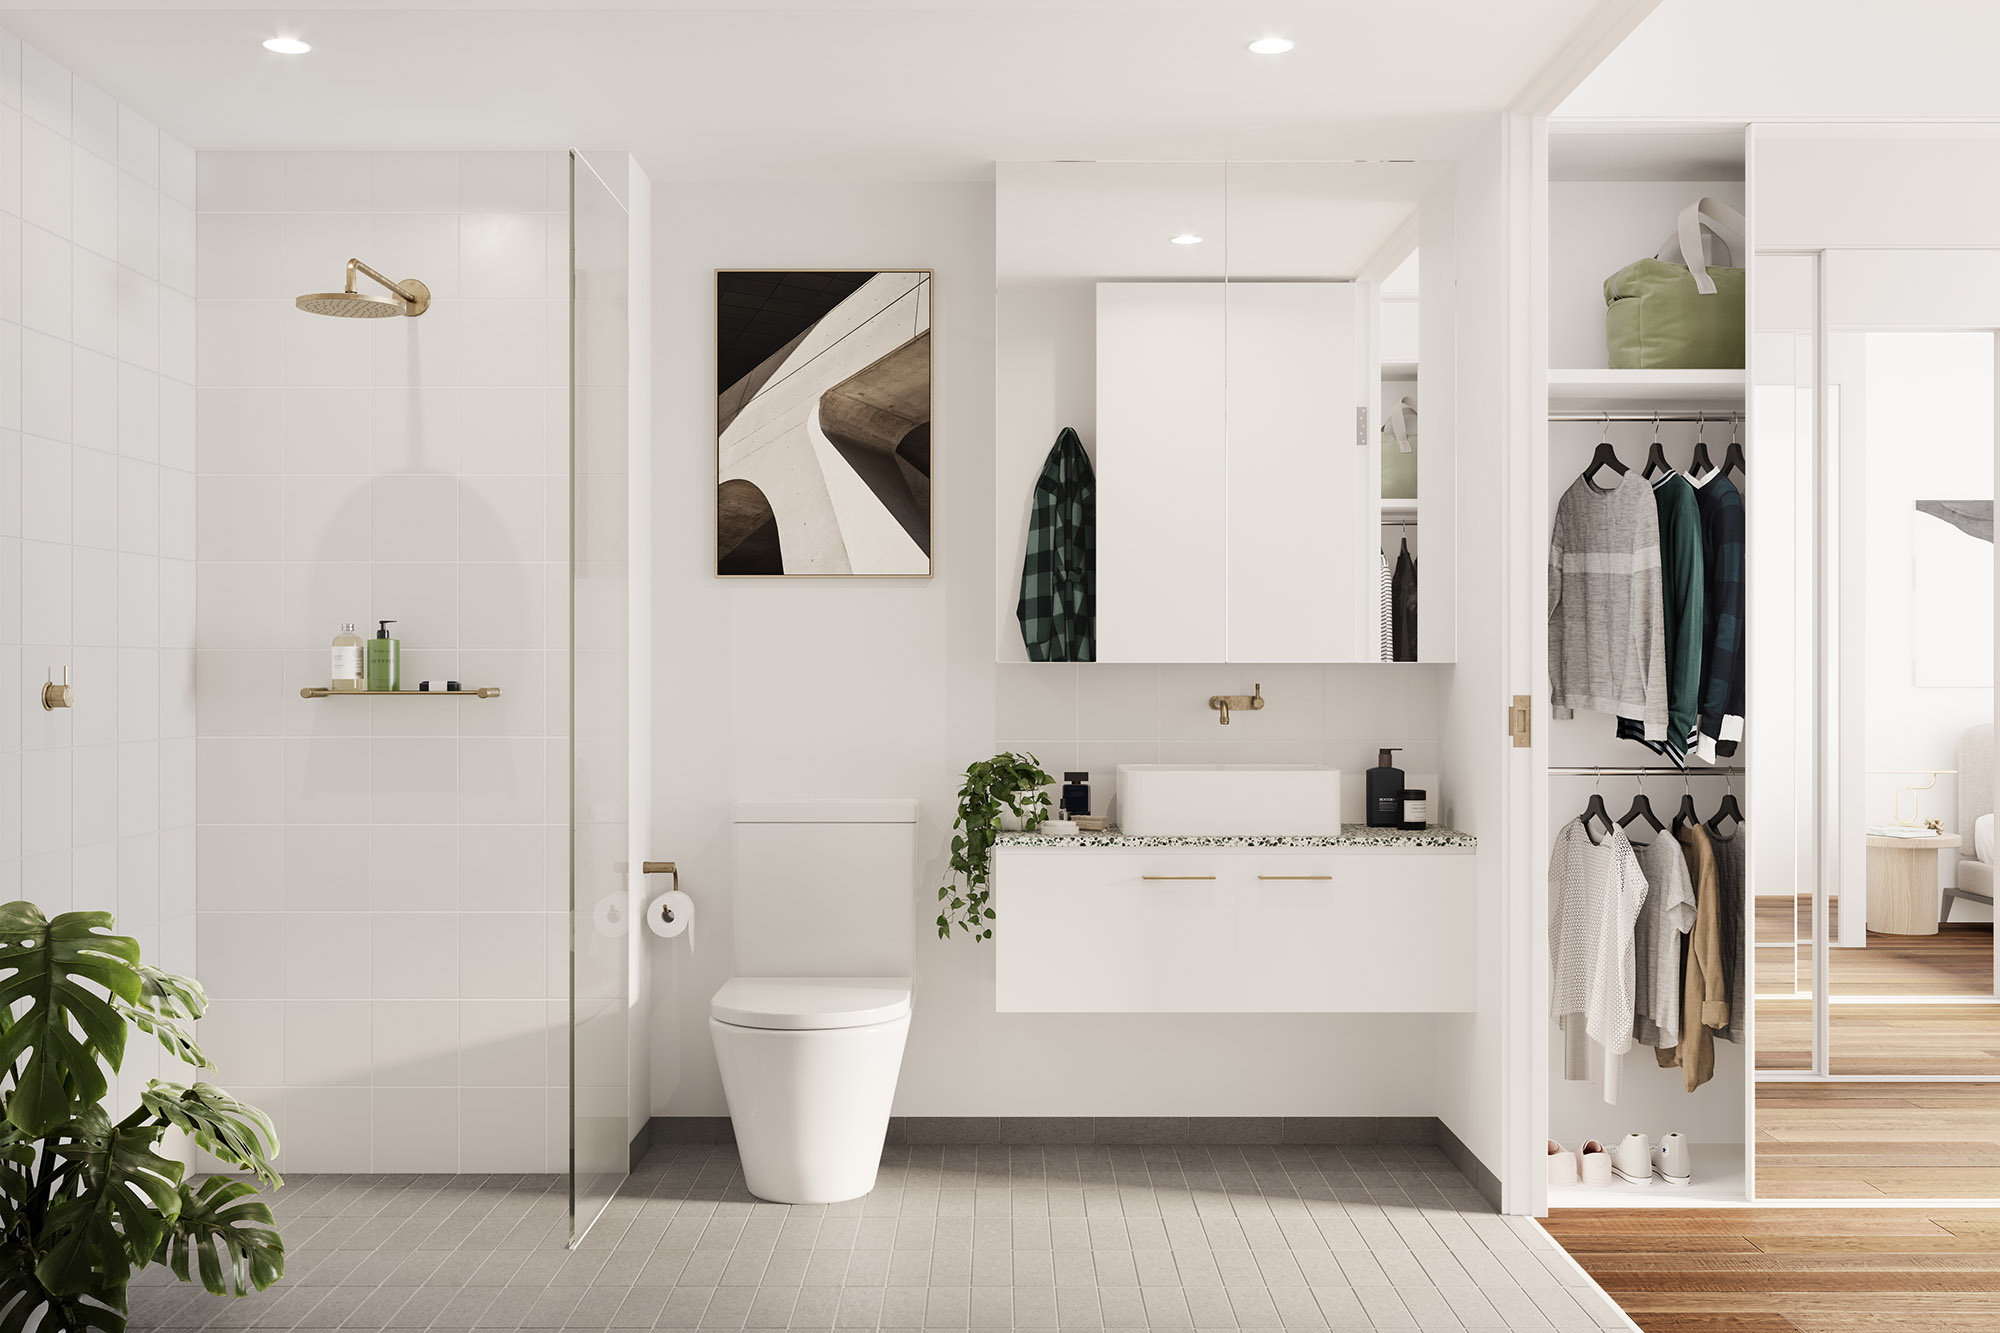 180410_Interior_Bathroom_00_LR.jpg